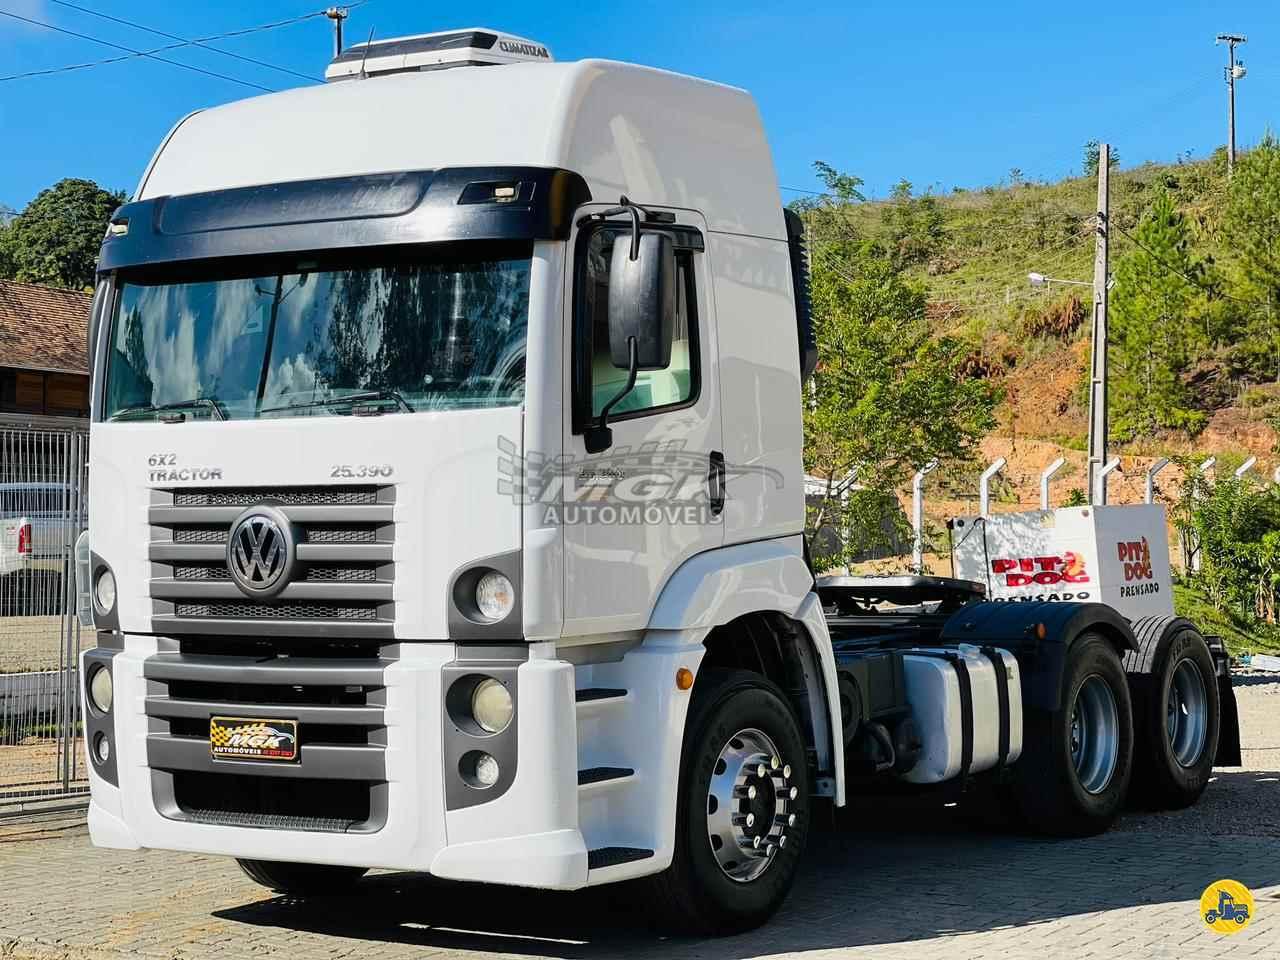 CAMINHAO VOLKSWAGEN VW 25390 Cavalo Mecânico Truck 6x2 MGK Automóveis IBIRAMA SANTA CATARINA SC